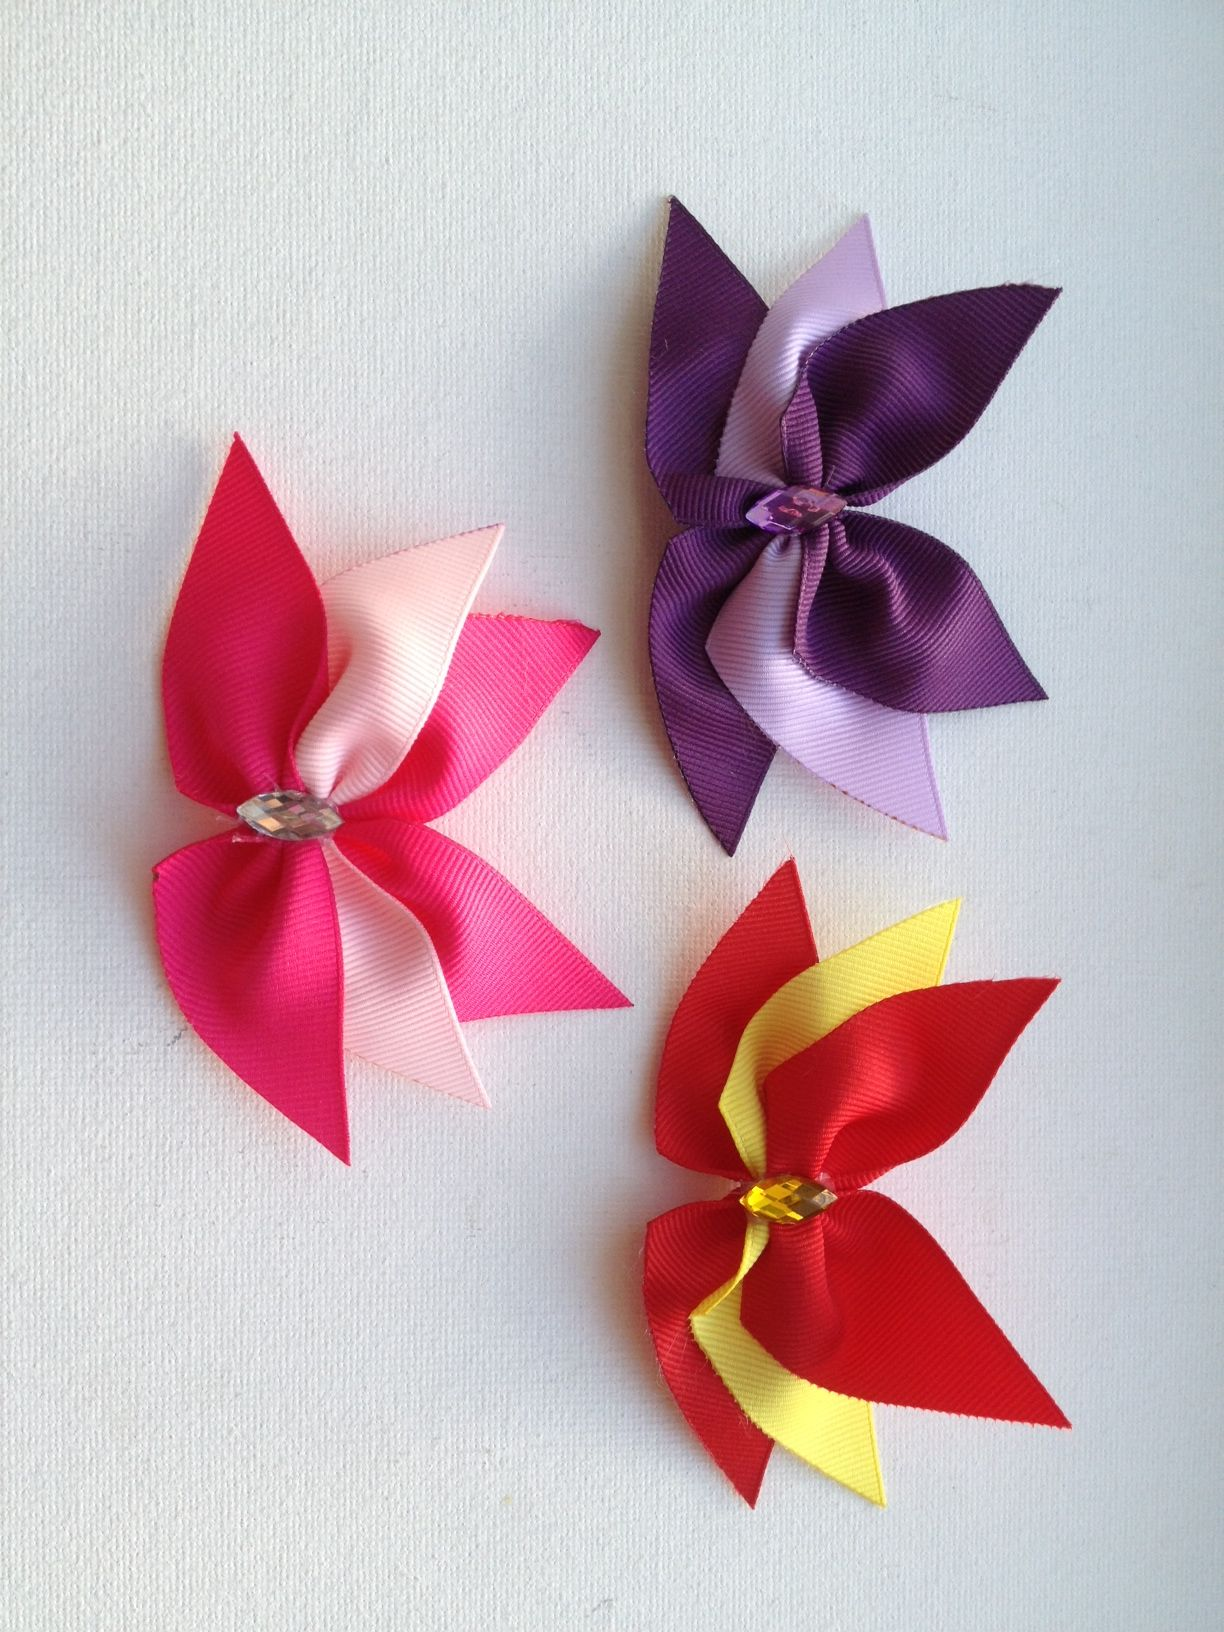 collar bow opawz.com